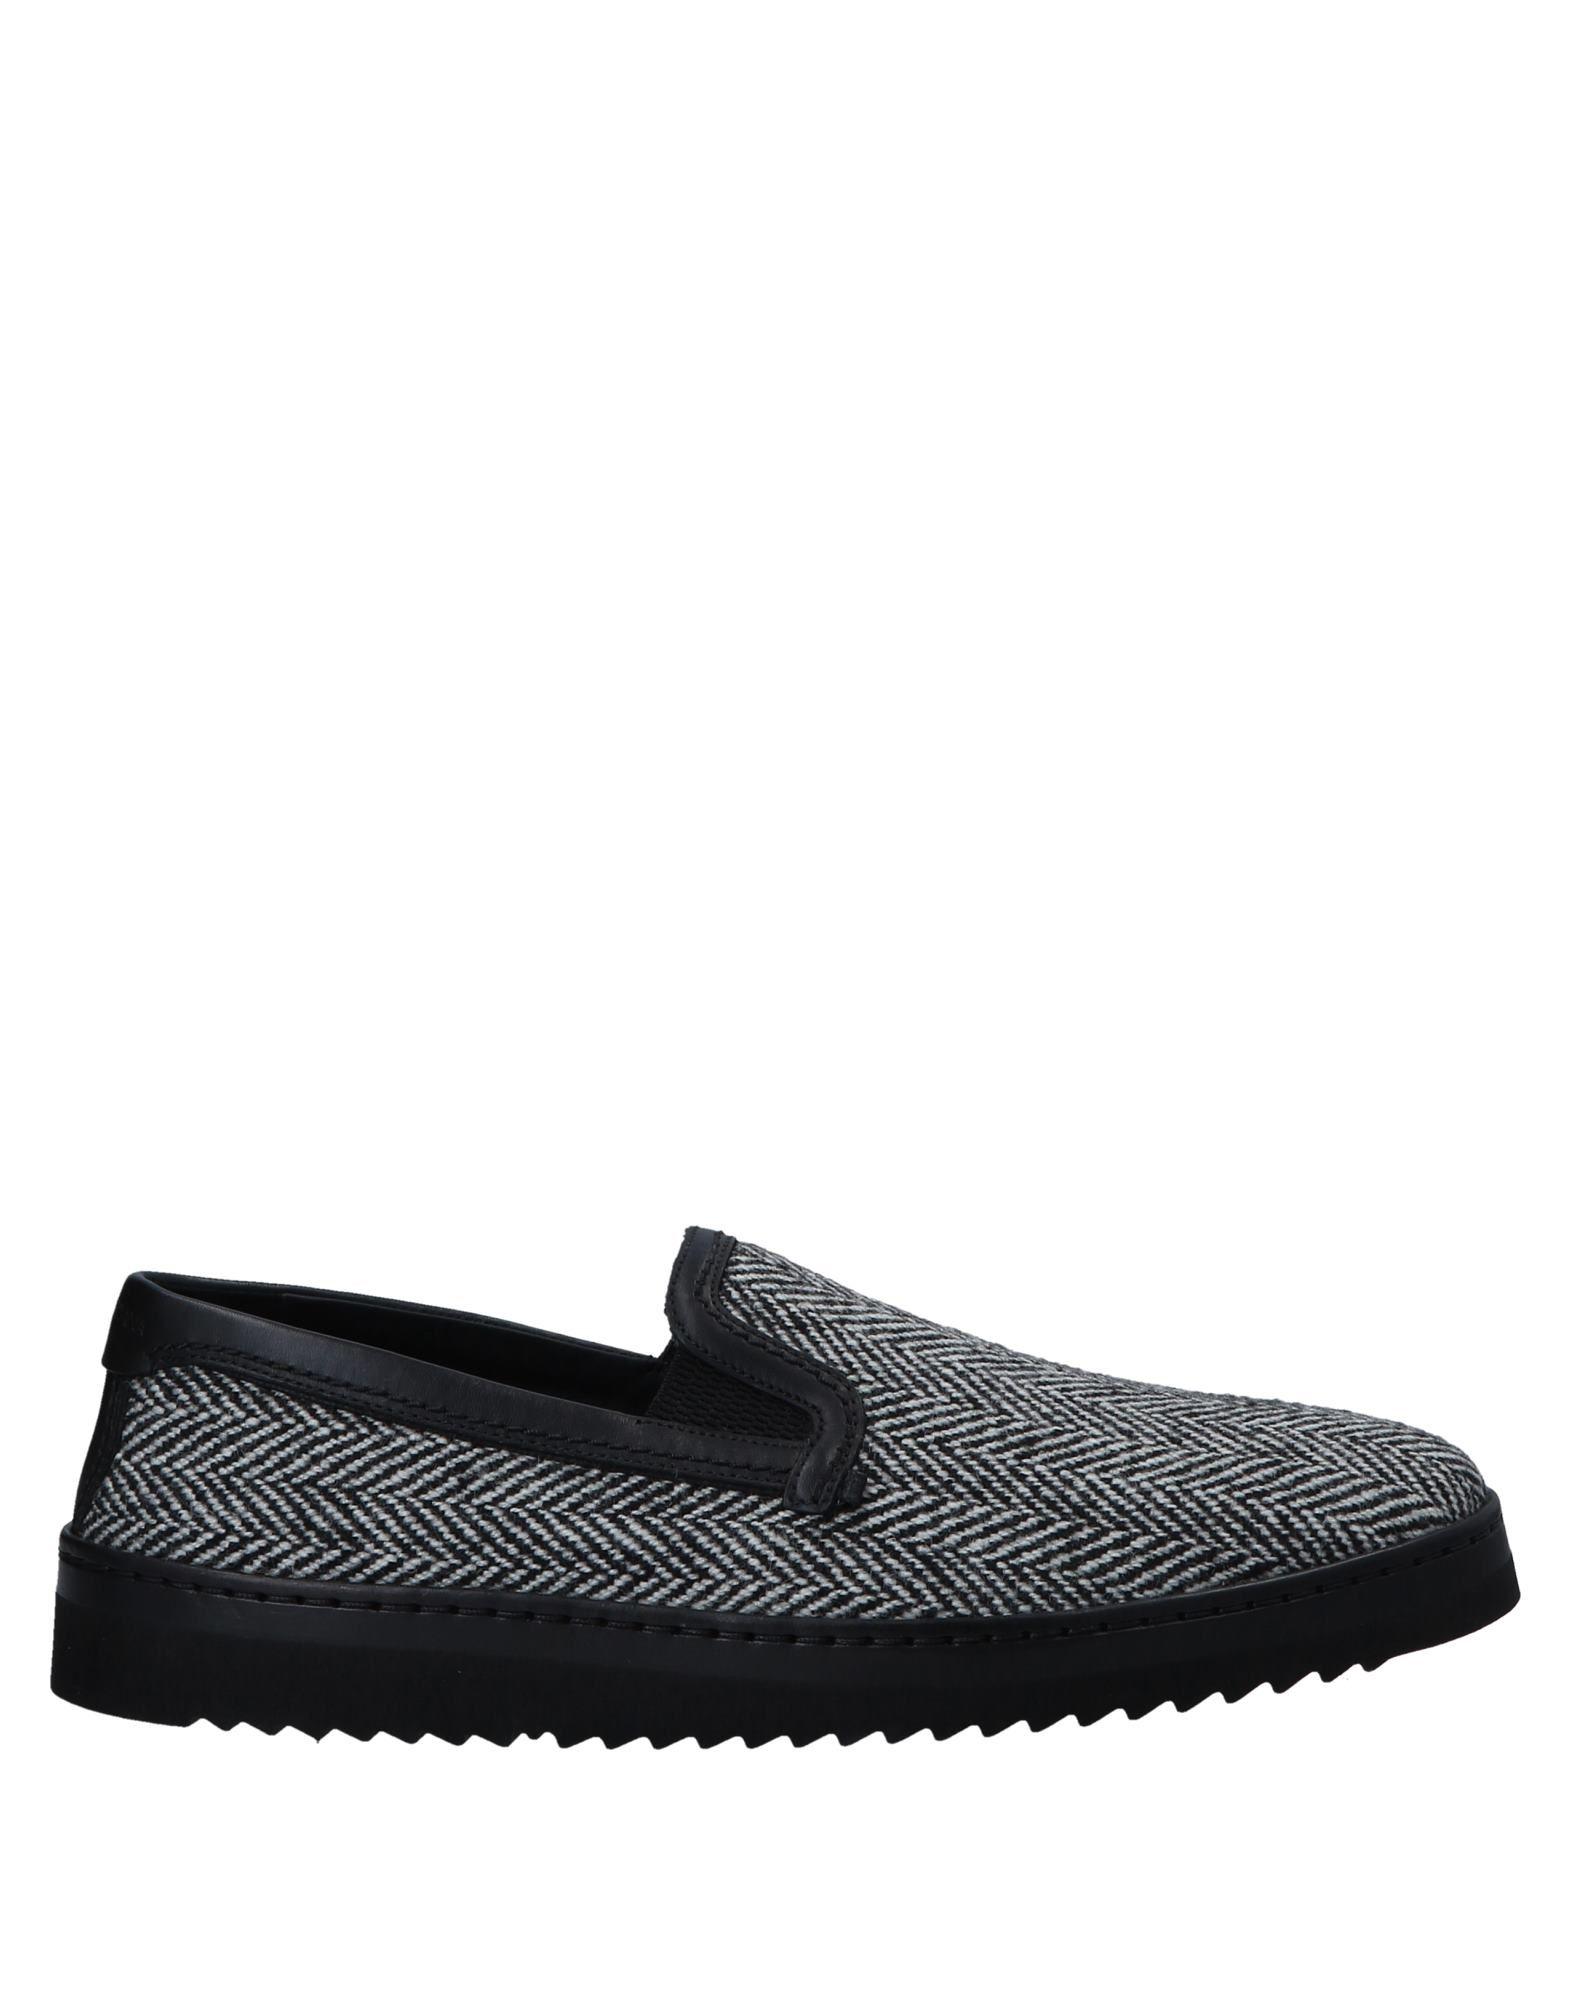 Dolce & Gabbana Sneakers Herren  11554870CP Gute Qualität beliebte Schuhe